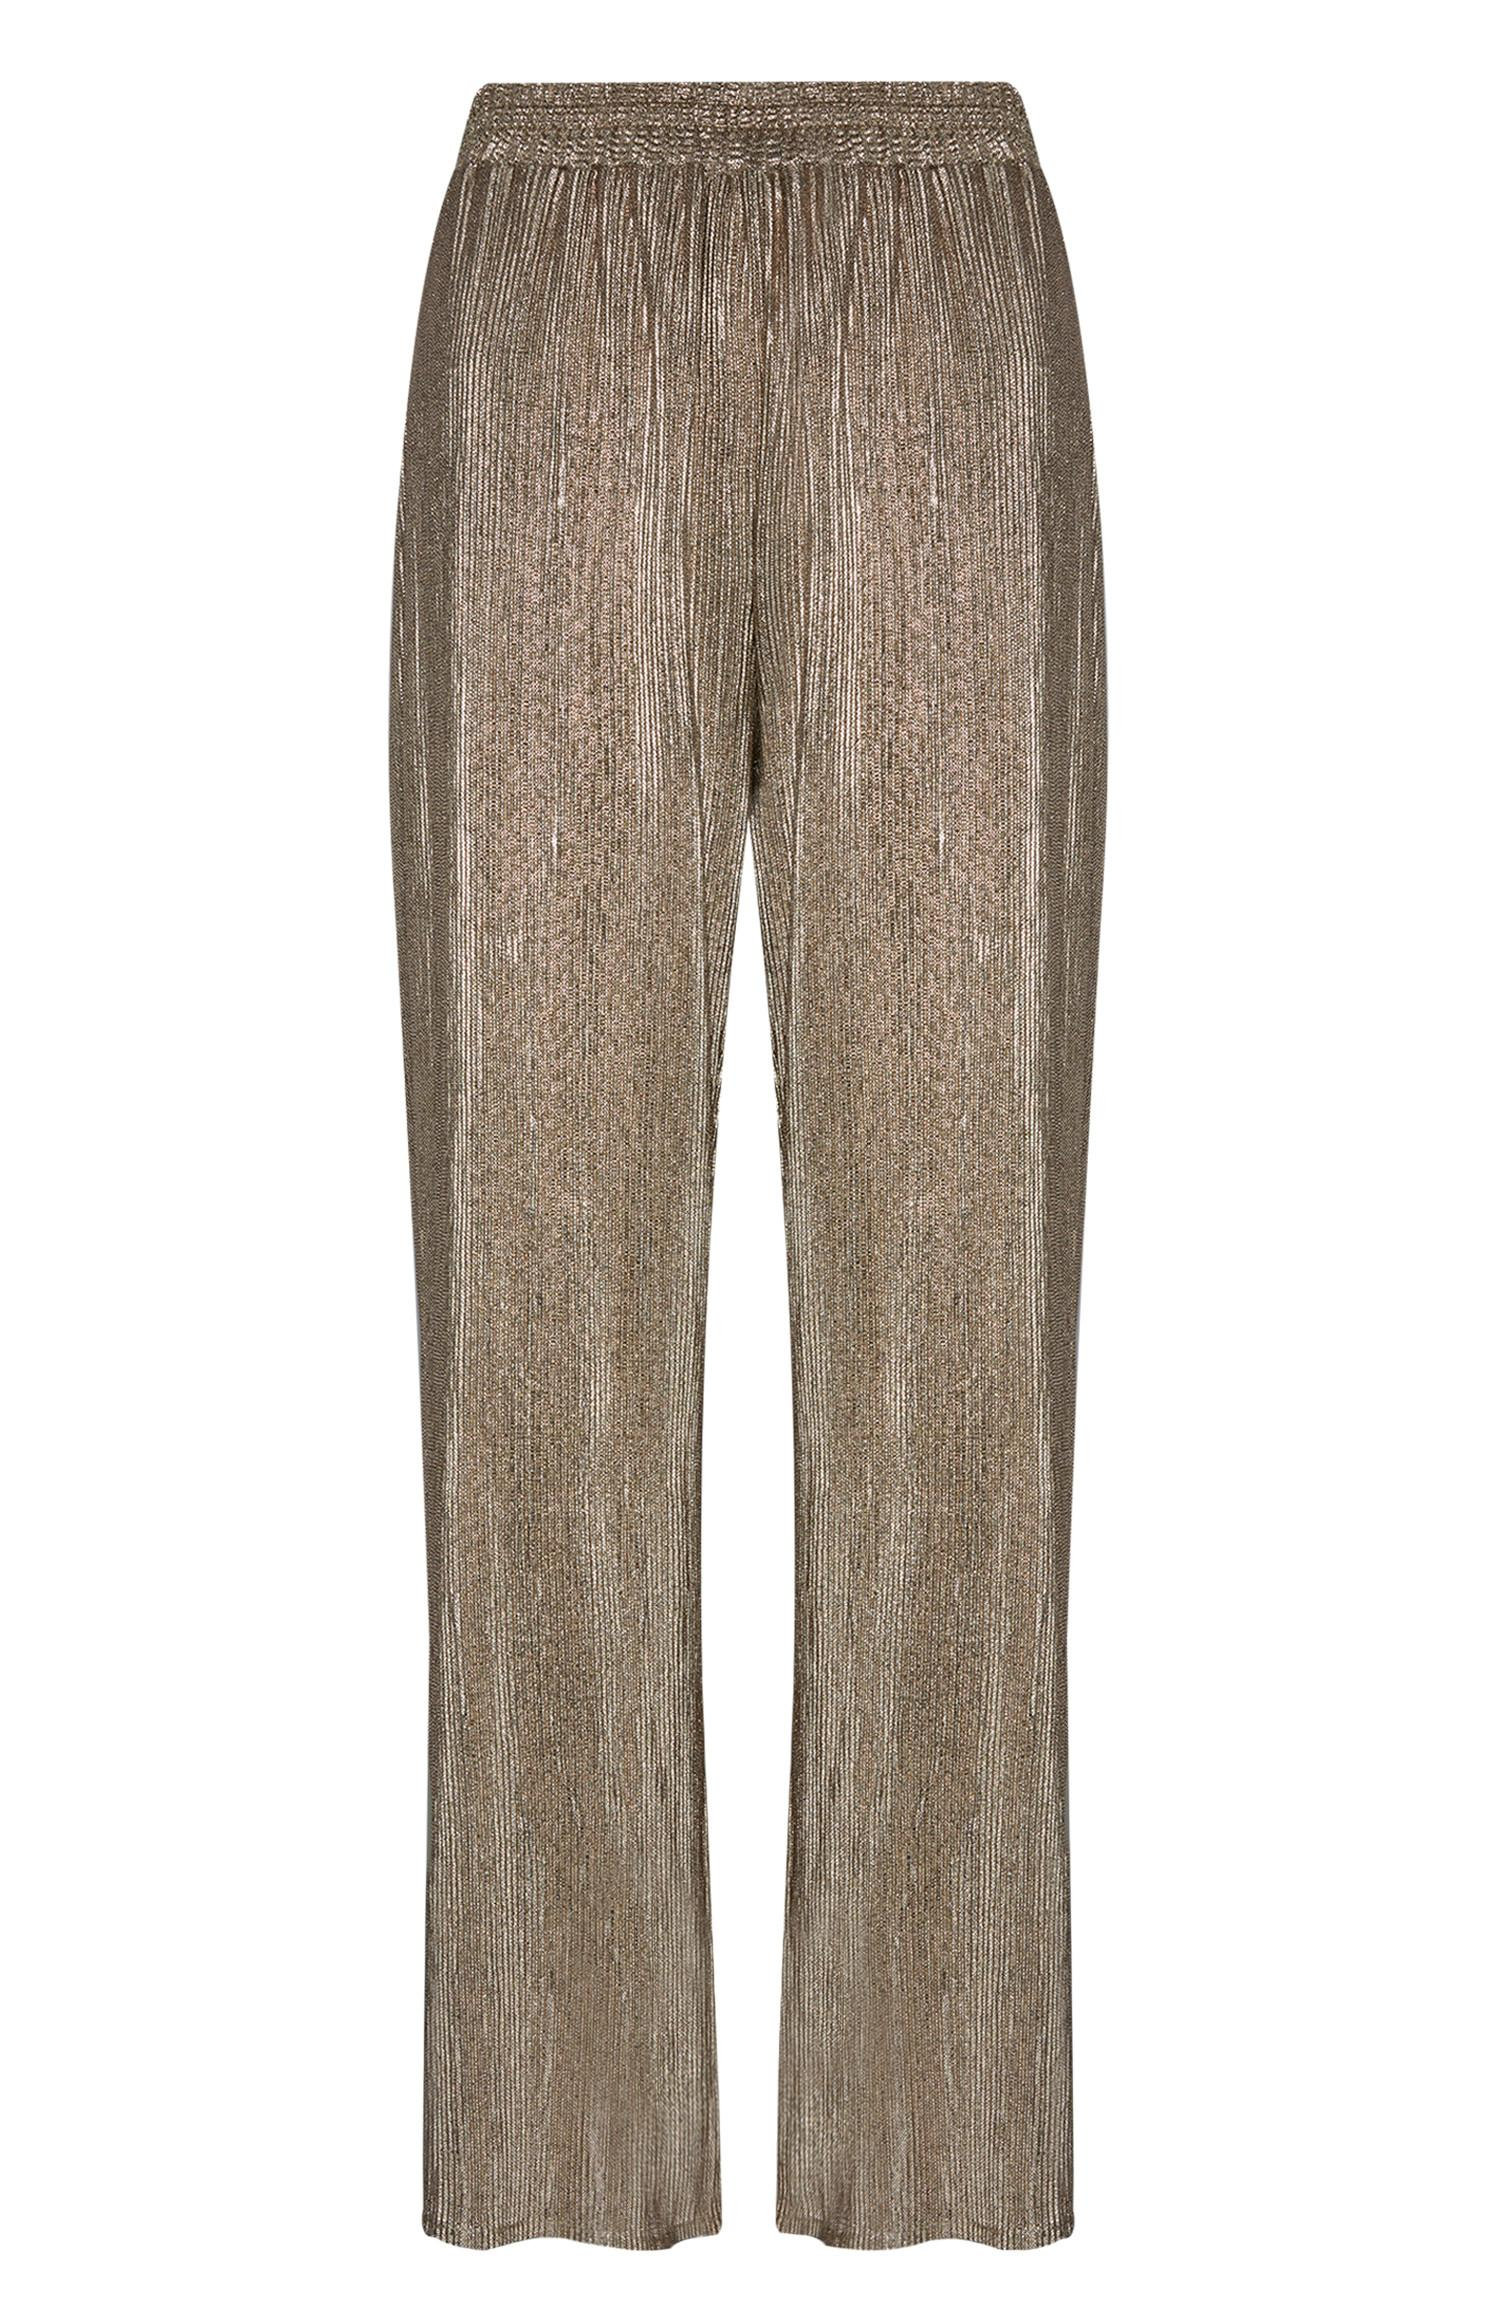 Gold Sparkle Trouser